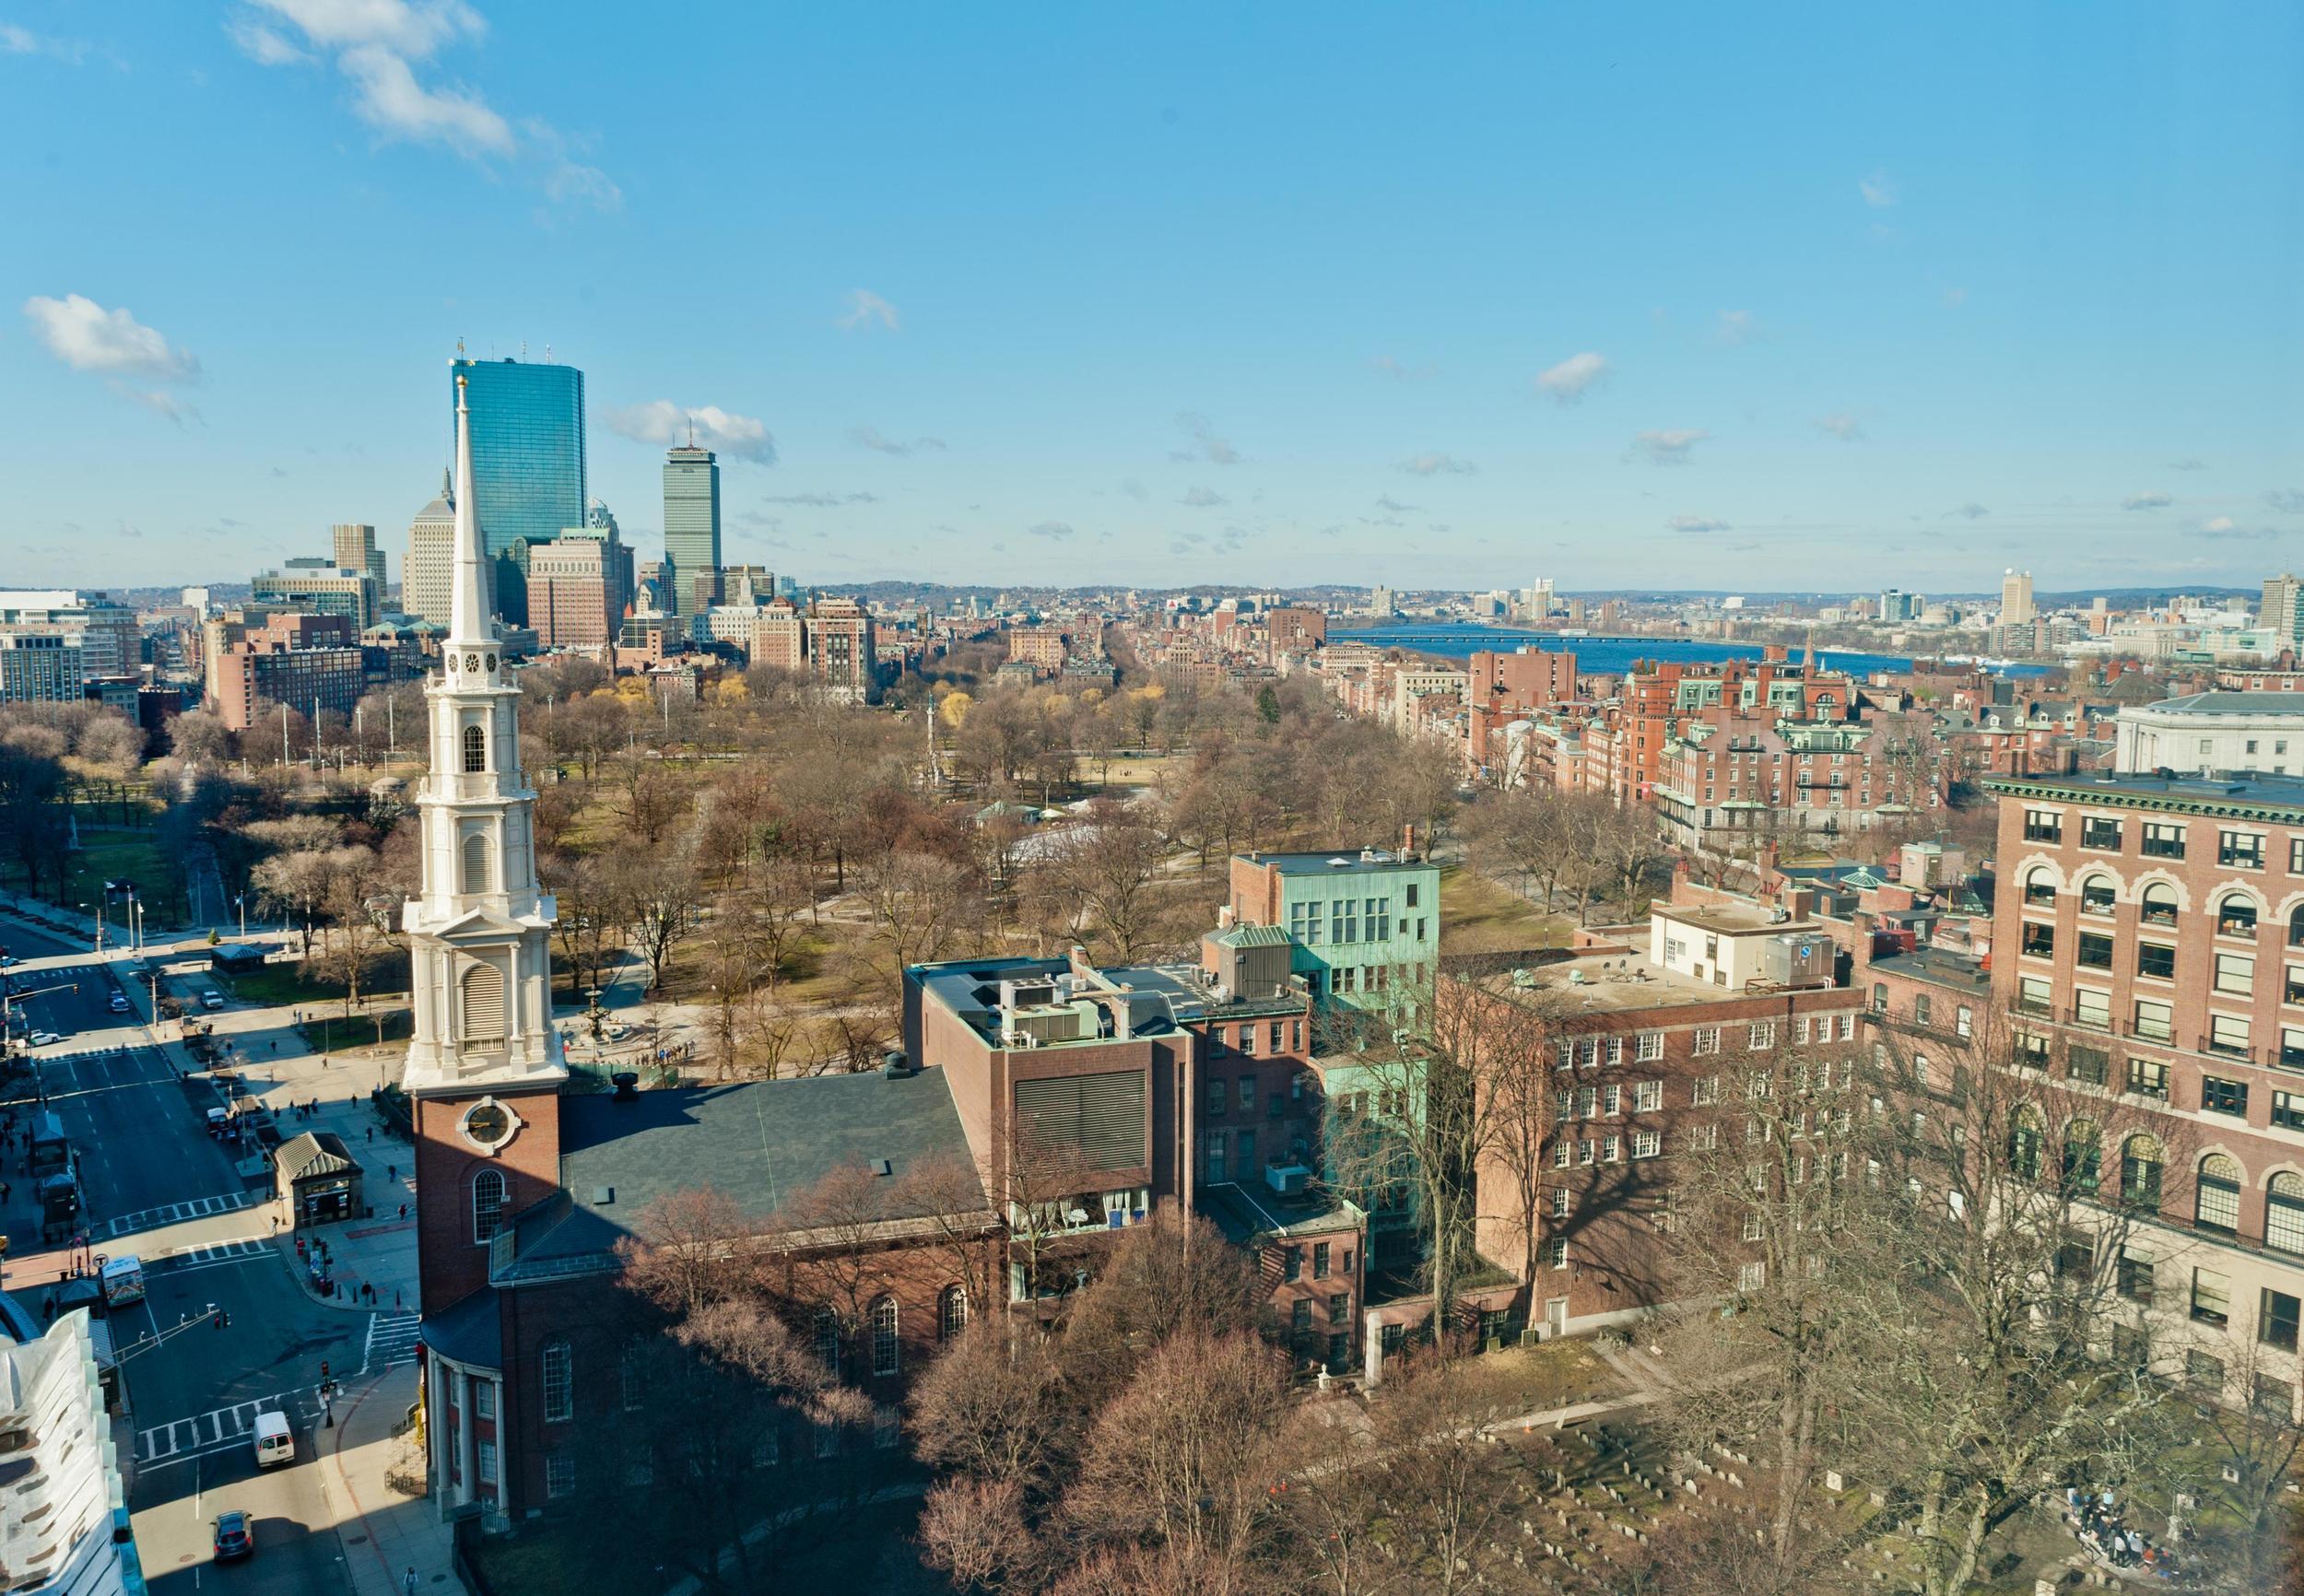 cityscape-boston_23371271982_o.jpg